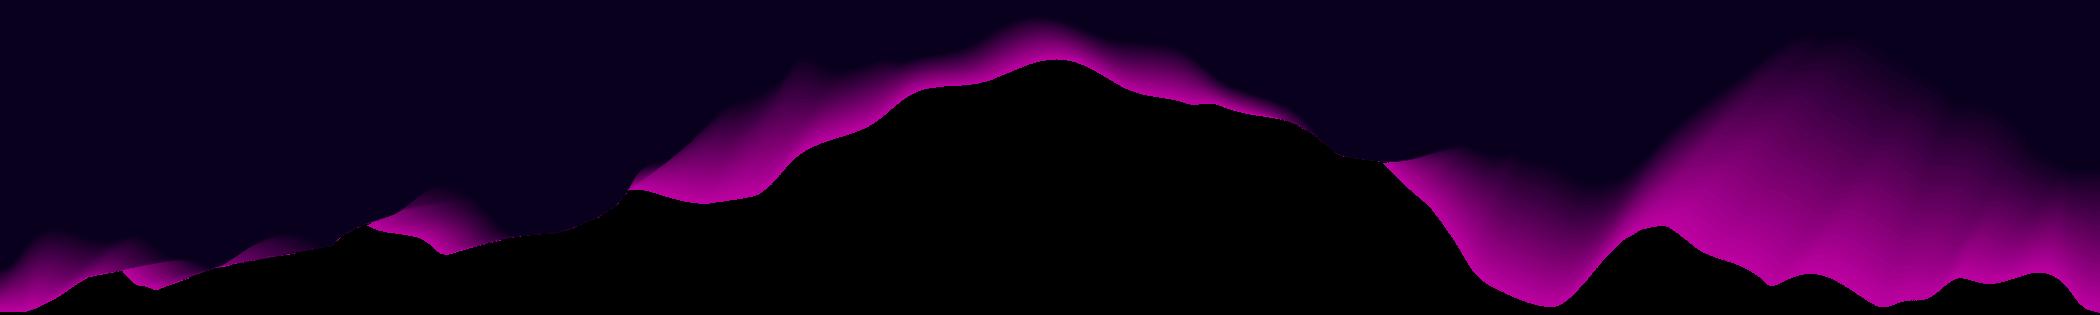 https://stellarium.bold-themes.com/color/wp-content/uploads/sites/5/2018/05/purple_bottom_divider.png